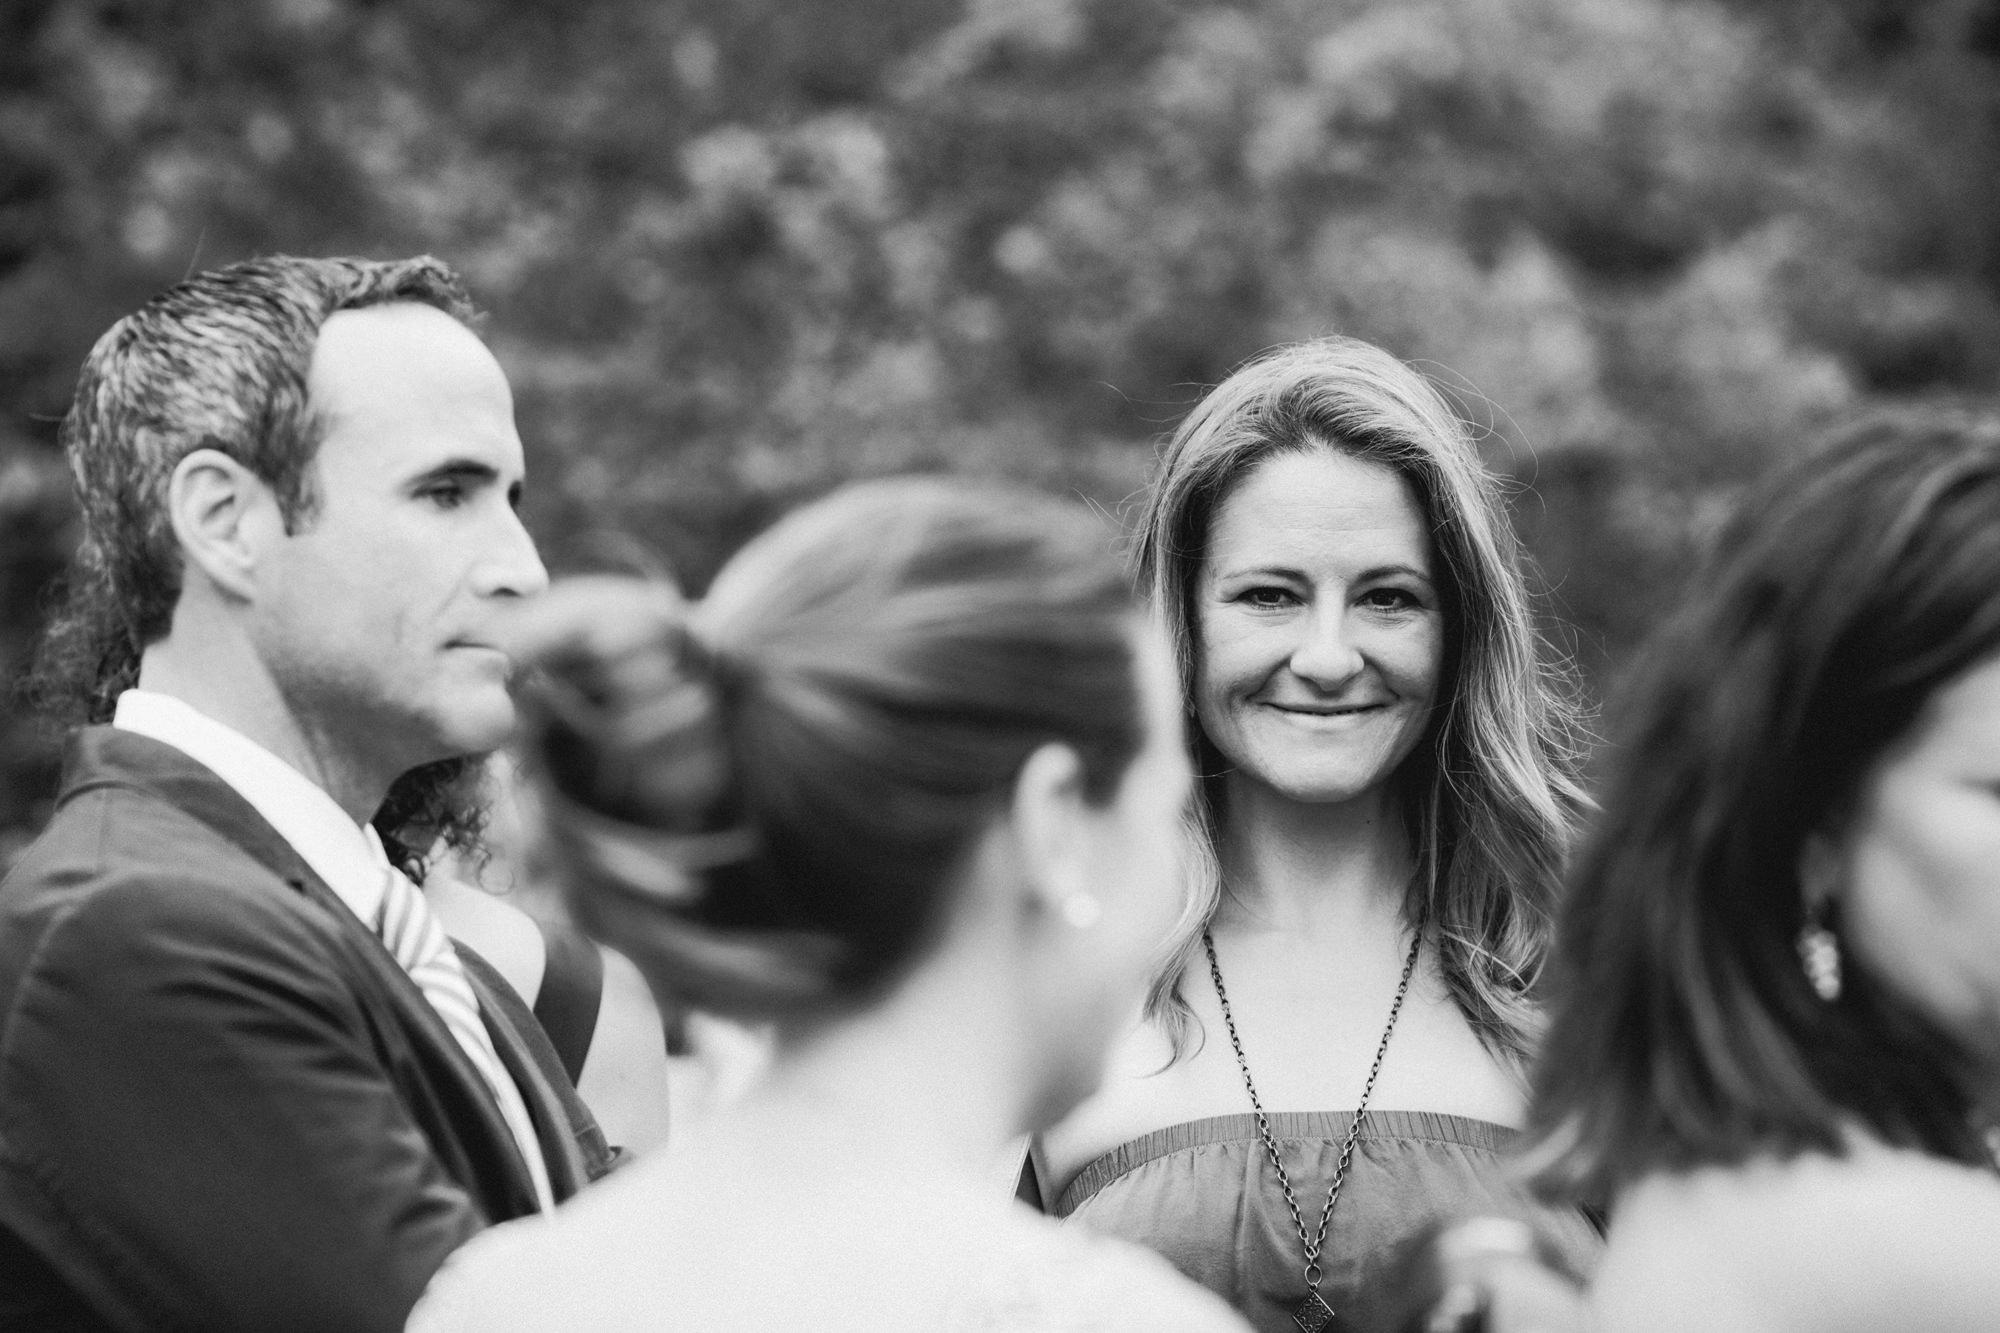 catskills_big_indian_springs_upstate_NY_wedding_sammblake036.jpg